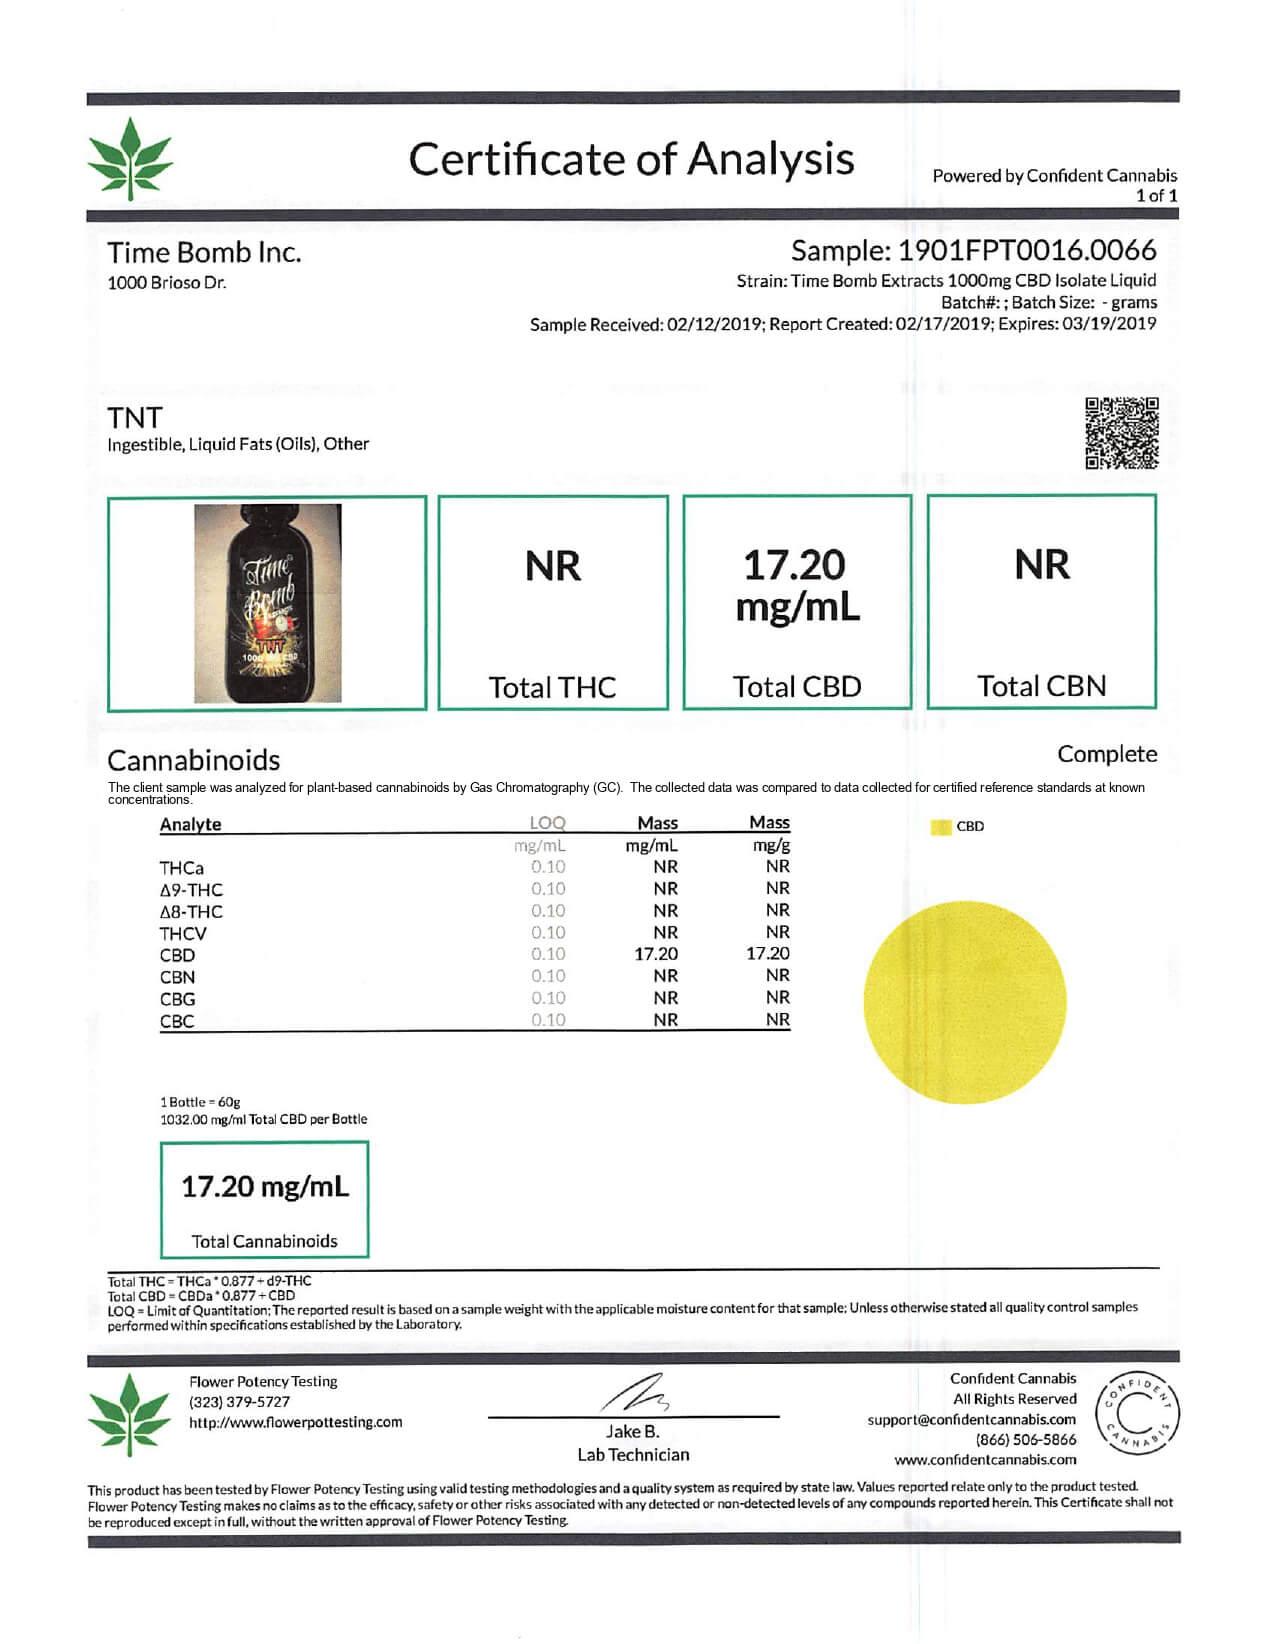 Time Bomb Extracts CBD Vape Juice TNT 1000mg Lab Report